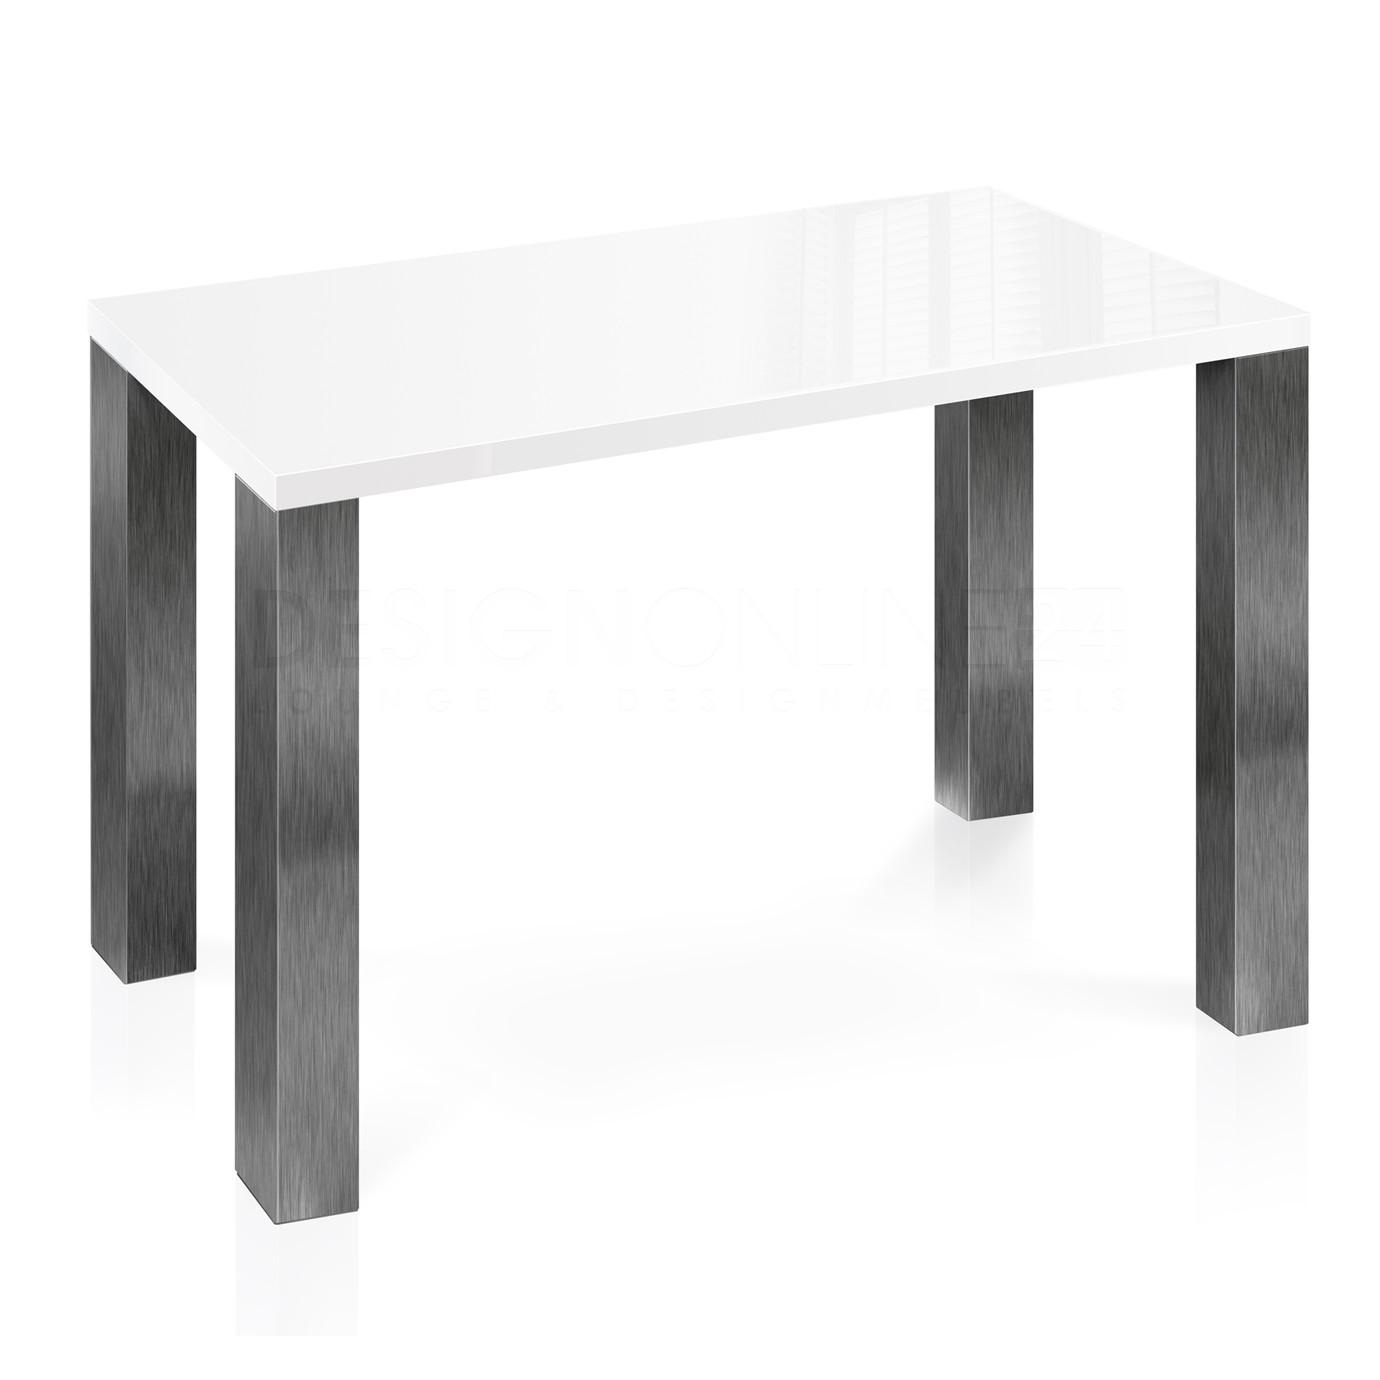 Hoogglans Keuken Krassen : 24designs Hoge Tafel 160 X 90 X 92 Cm – High Gloss Wit – Rvs Design